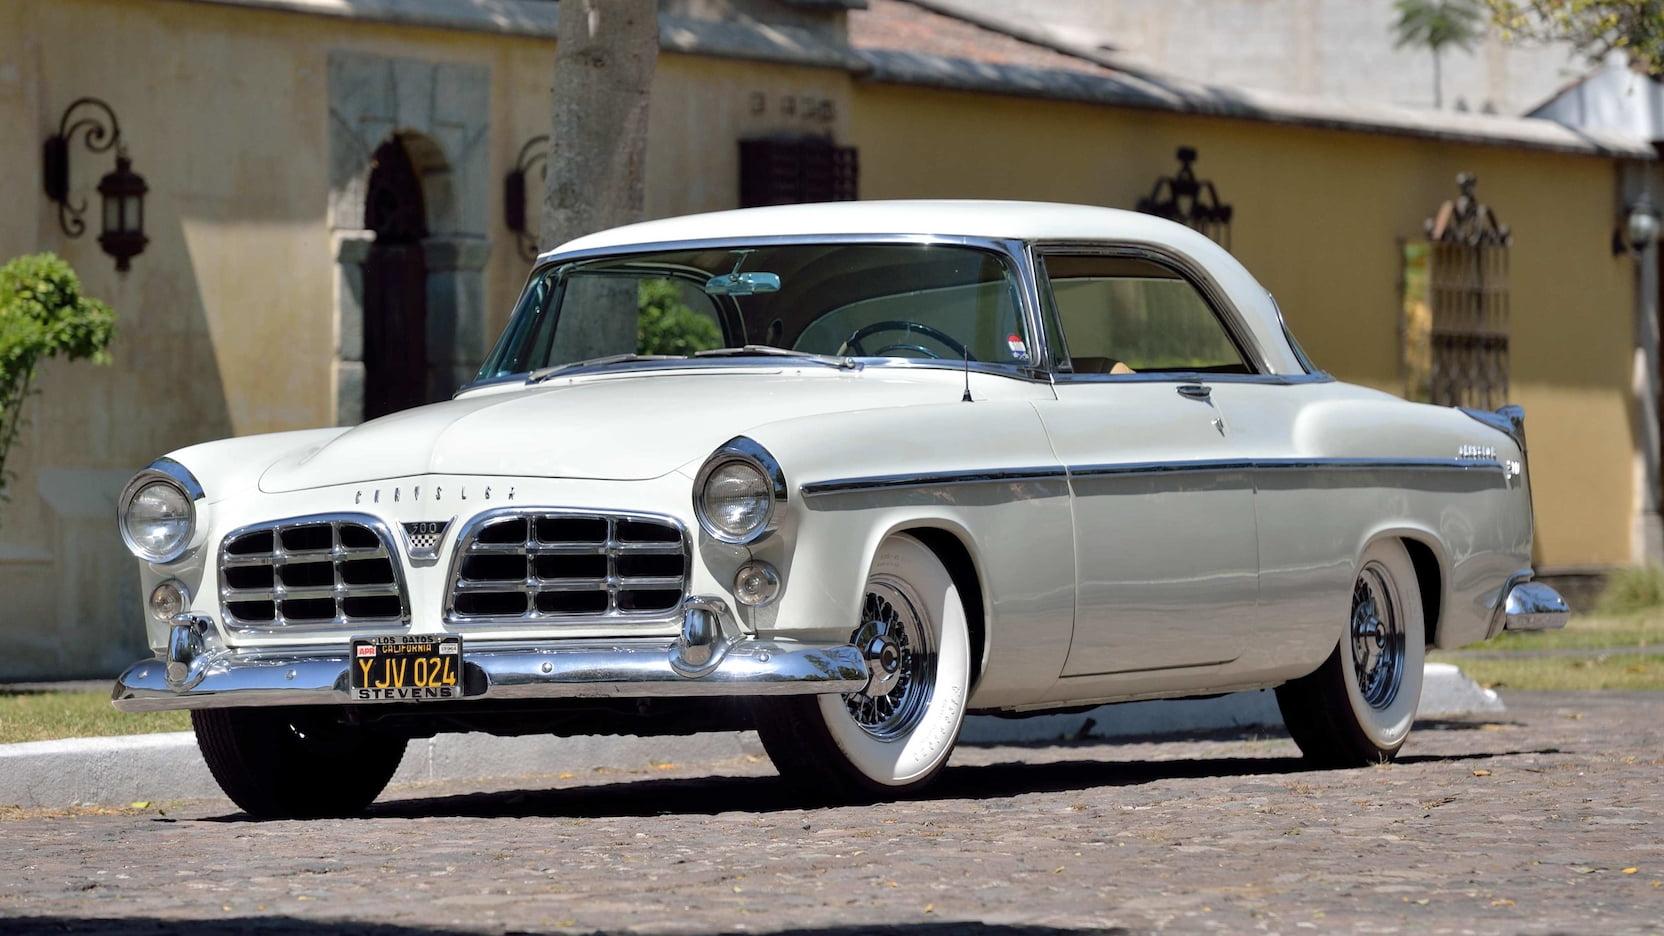 1955 Chrysler C-300 front three-quarter